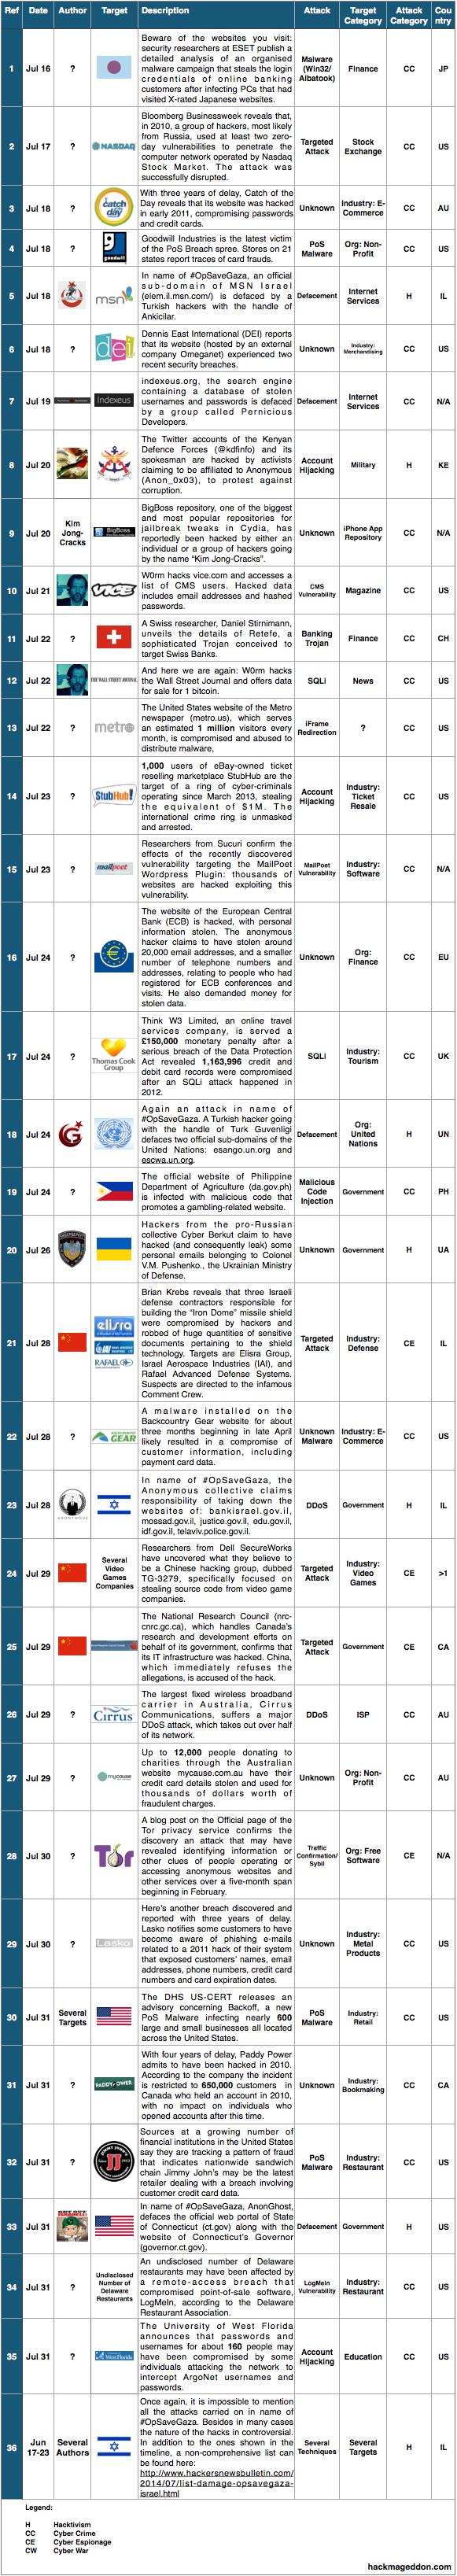 16-31 July 2014 Cyber Attacks Timeline